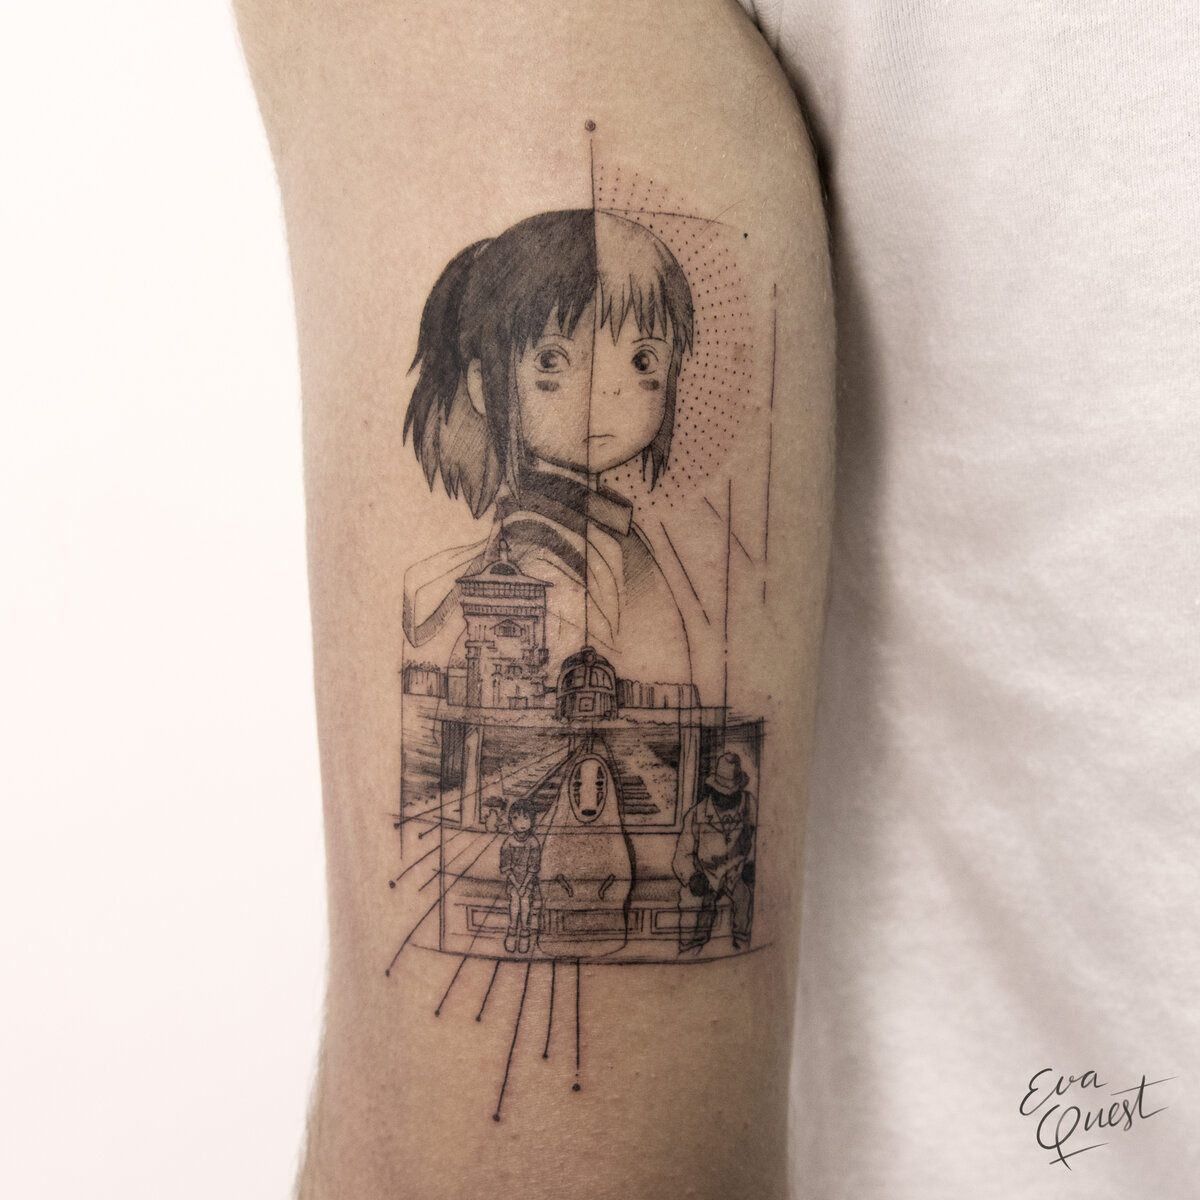 eva-quest-tattoo-artist-chihiro